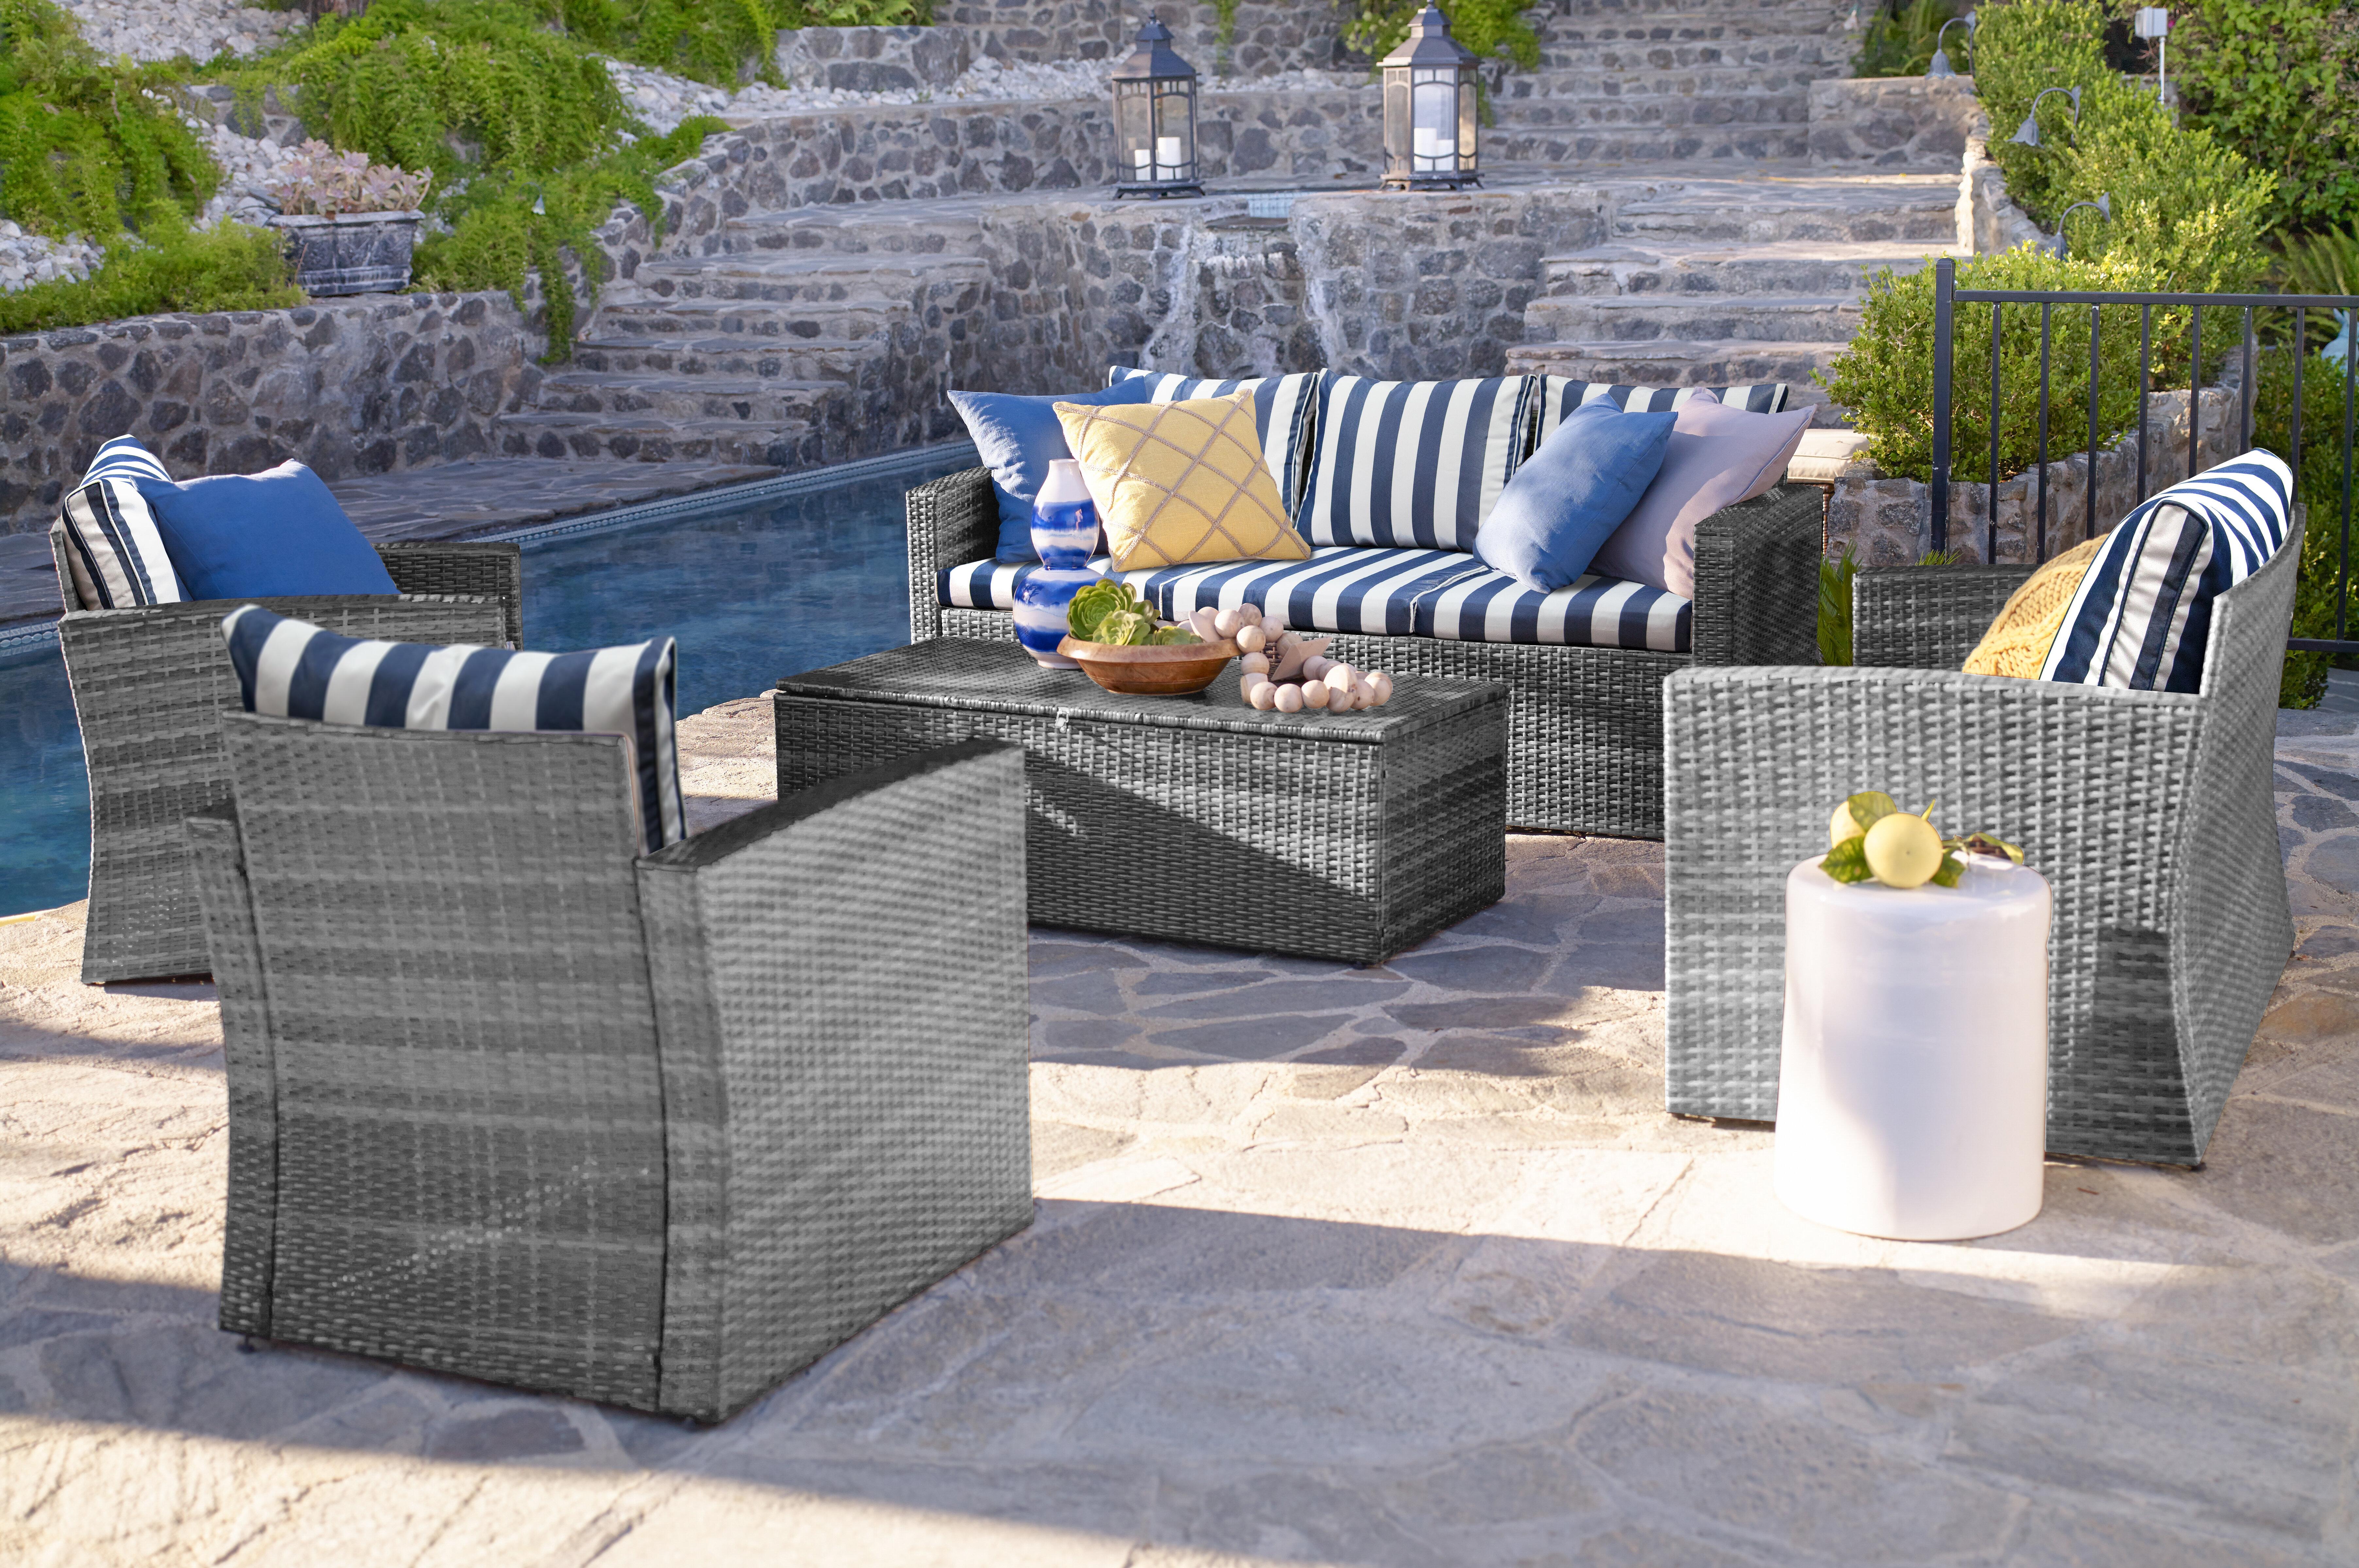 Breakwater bay ridgemoor 5 piece rattan sofa seating group with cushions reviews wayfair